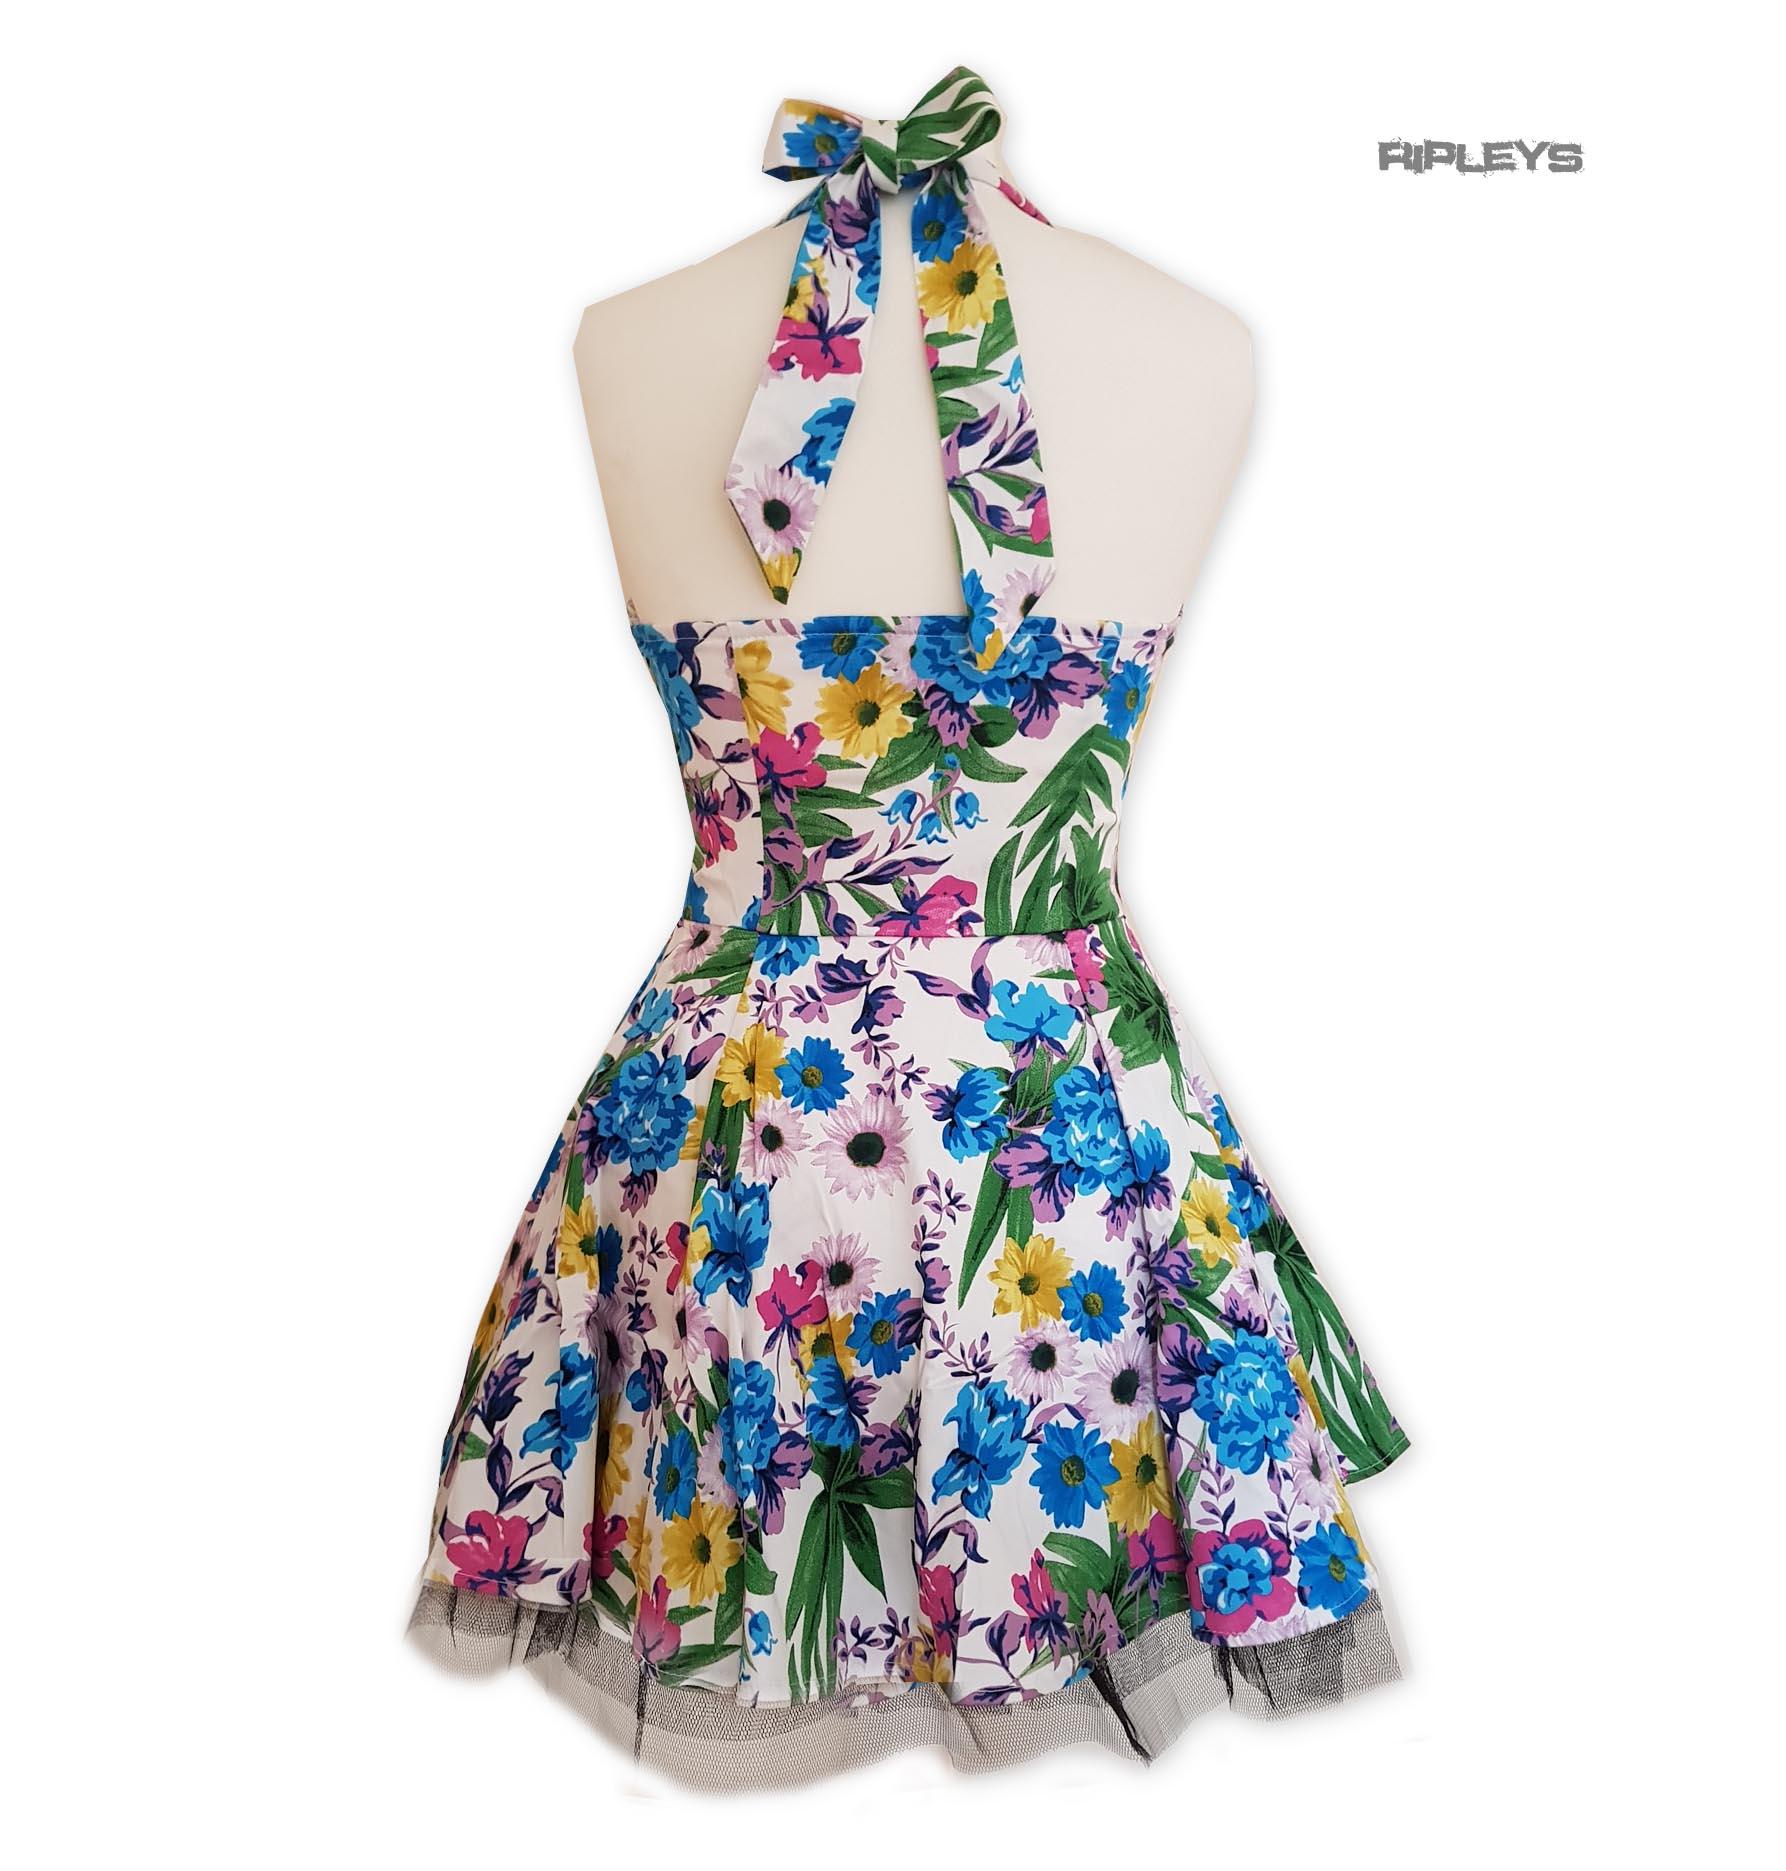 H-amp-R-Hearts-amp-Roses-London-White-Mini-Dress-039-Summer-Day-039-Flowers-All-Sizes thumbnail 4